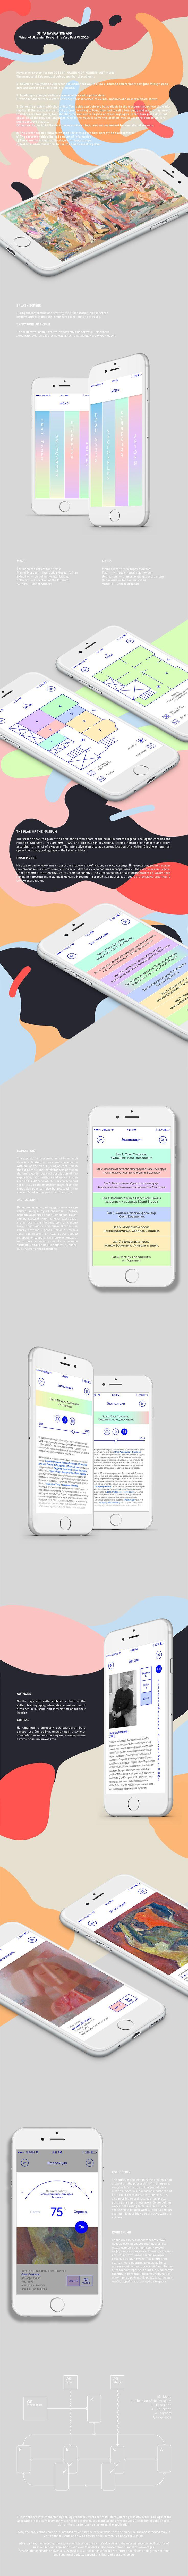 OMMA navigation App on Behance